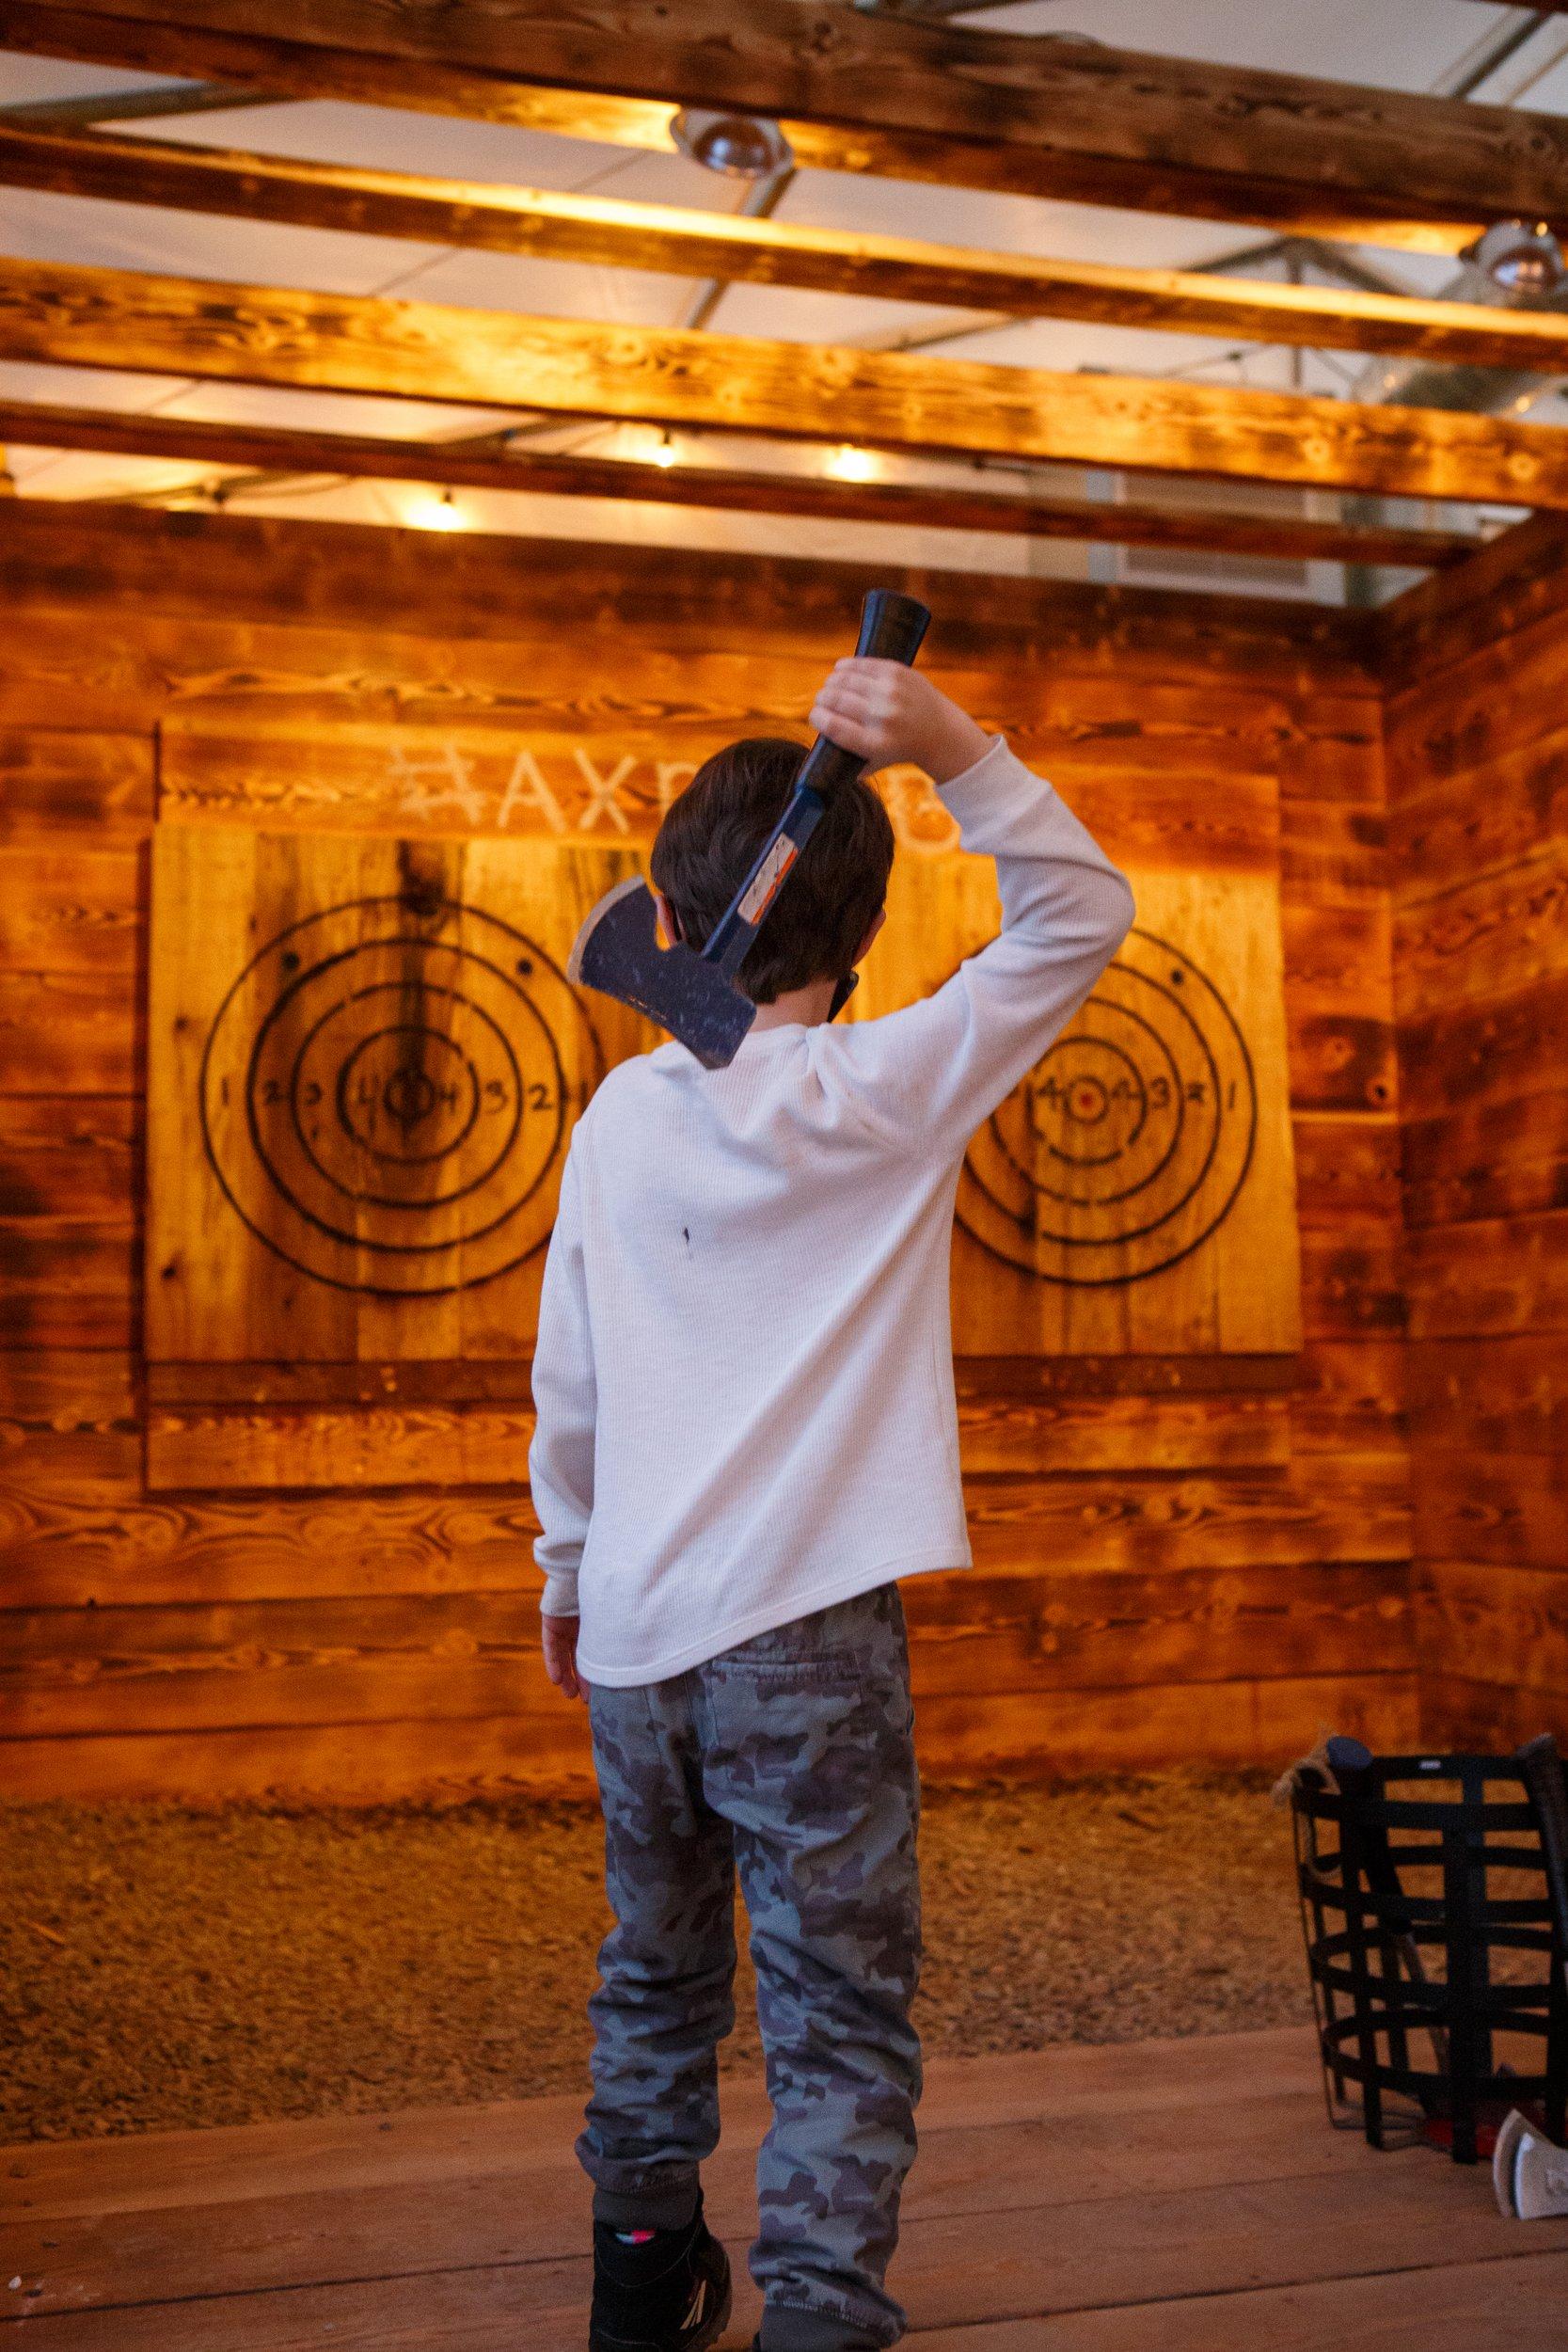 A young participant practices his axe throwing. Photos by Sue Rollyson.